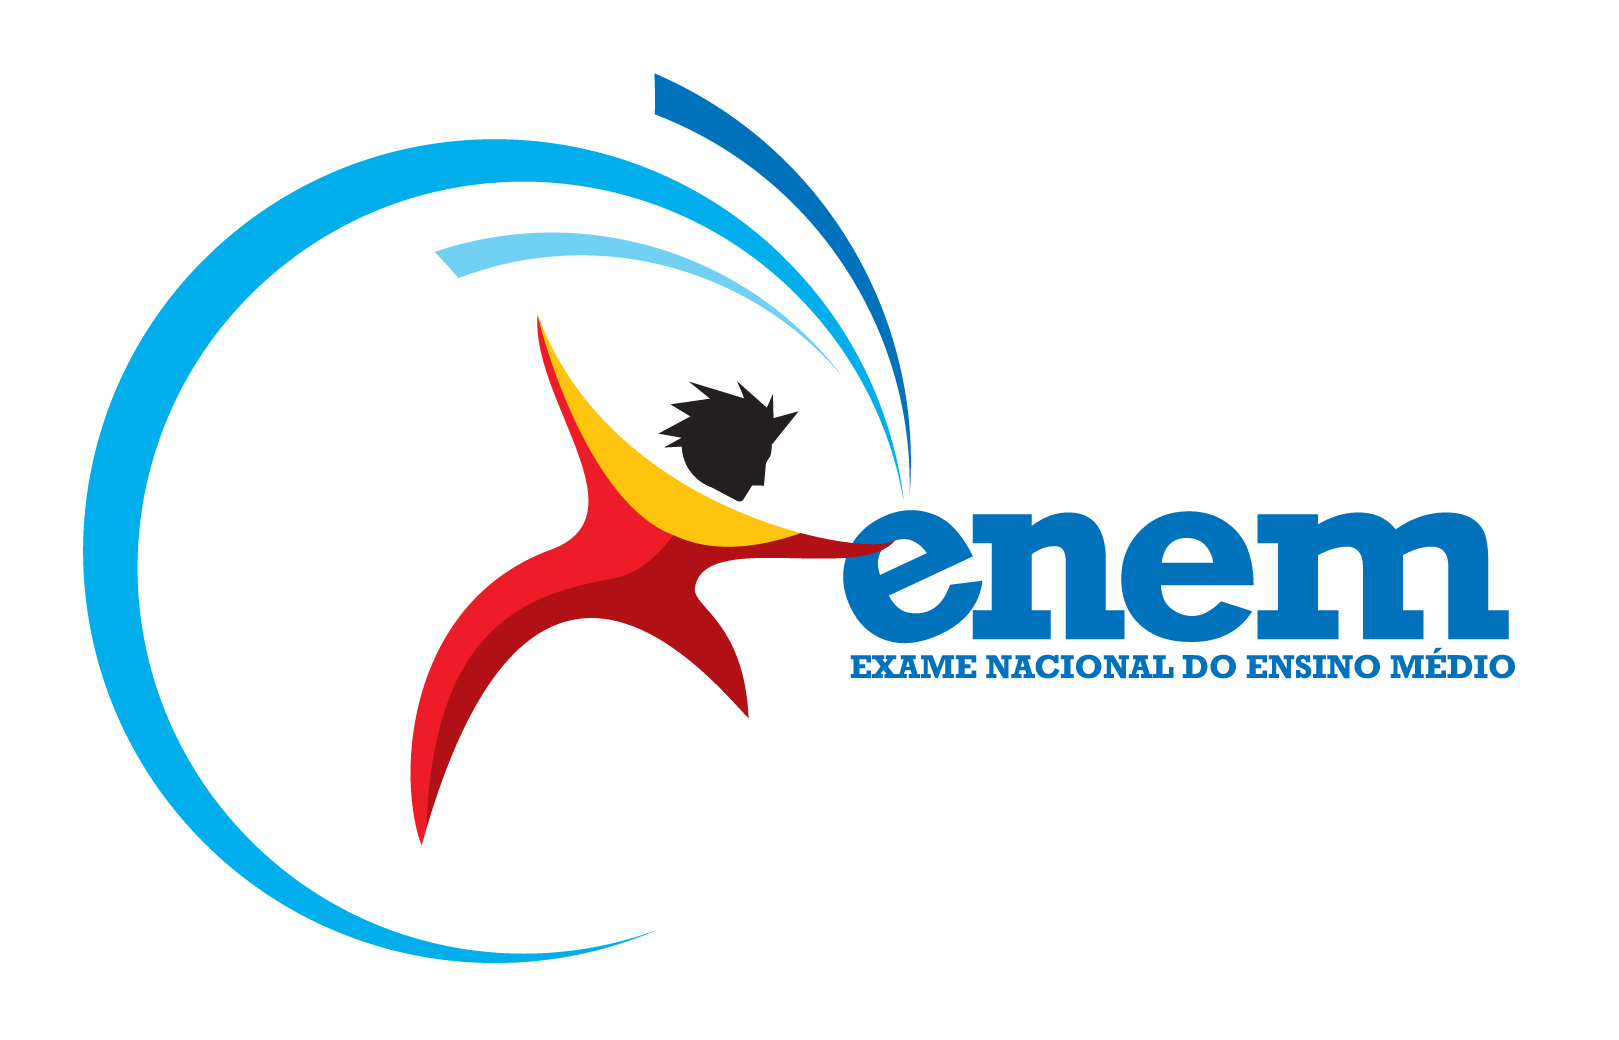 ENEM 2014: Resultado será divulgado hoje (13/1)